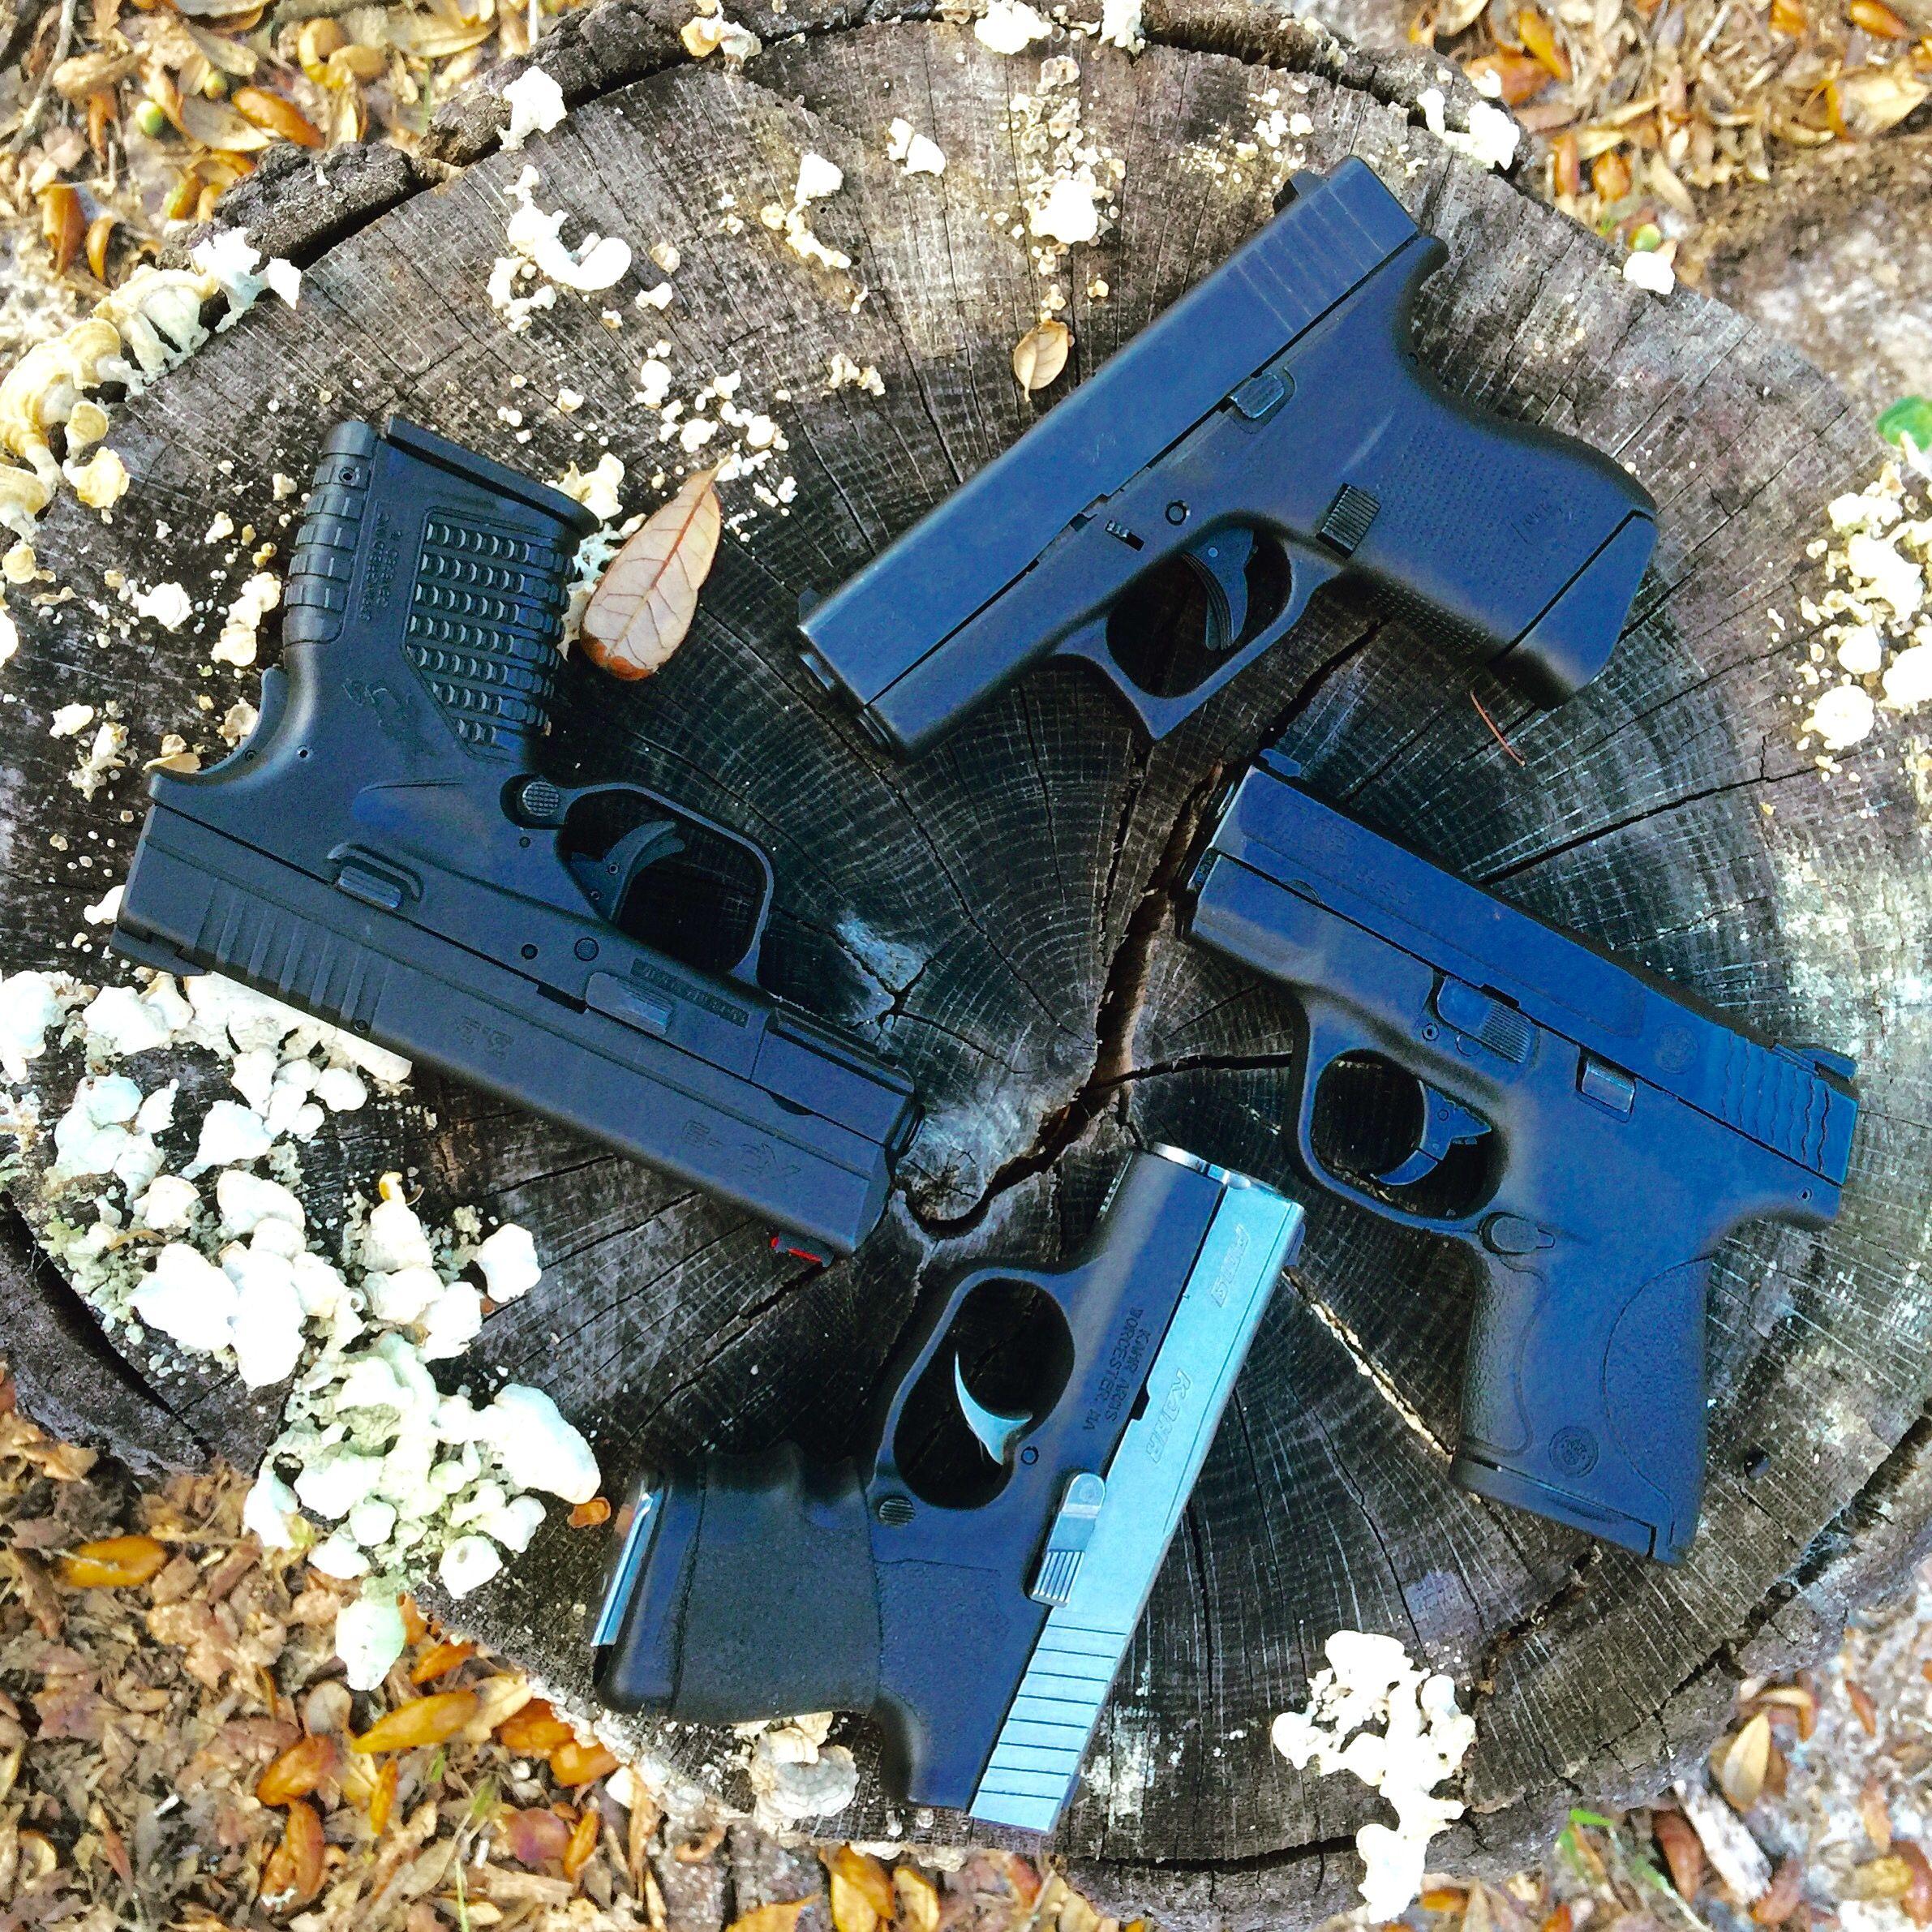 EDC 9mm handguns Kahr PM9, Smith and Wesson Shield, Glock 43